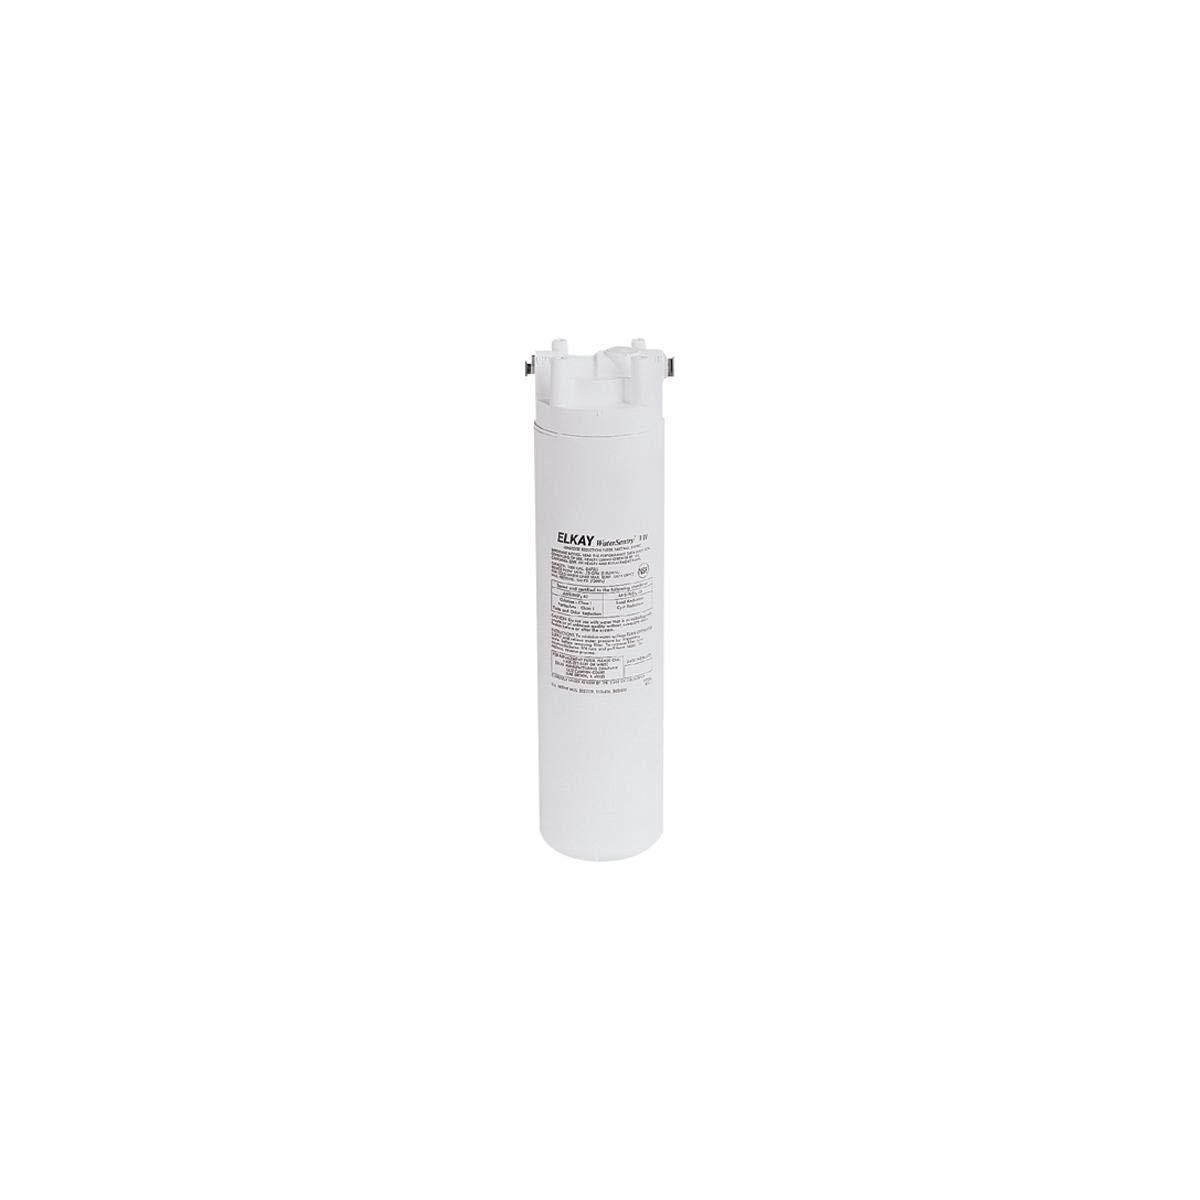 Elkay EWF3000 WaterSentry Plus Filter System Kit (Bottle Fillers)